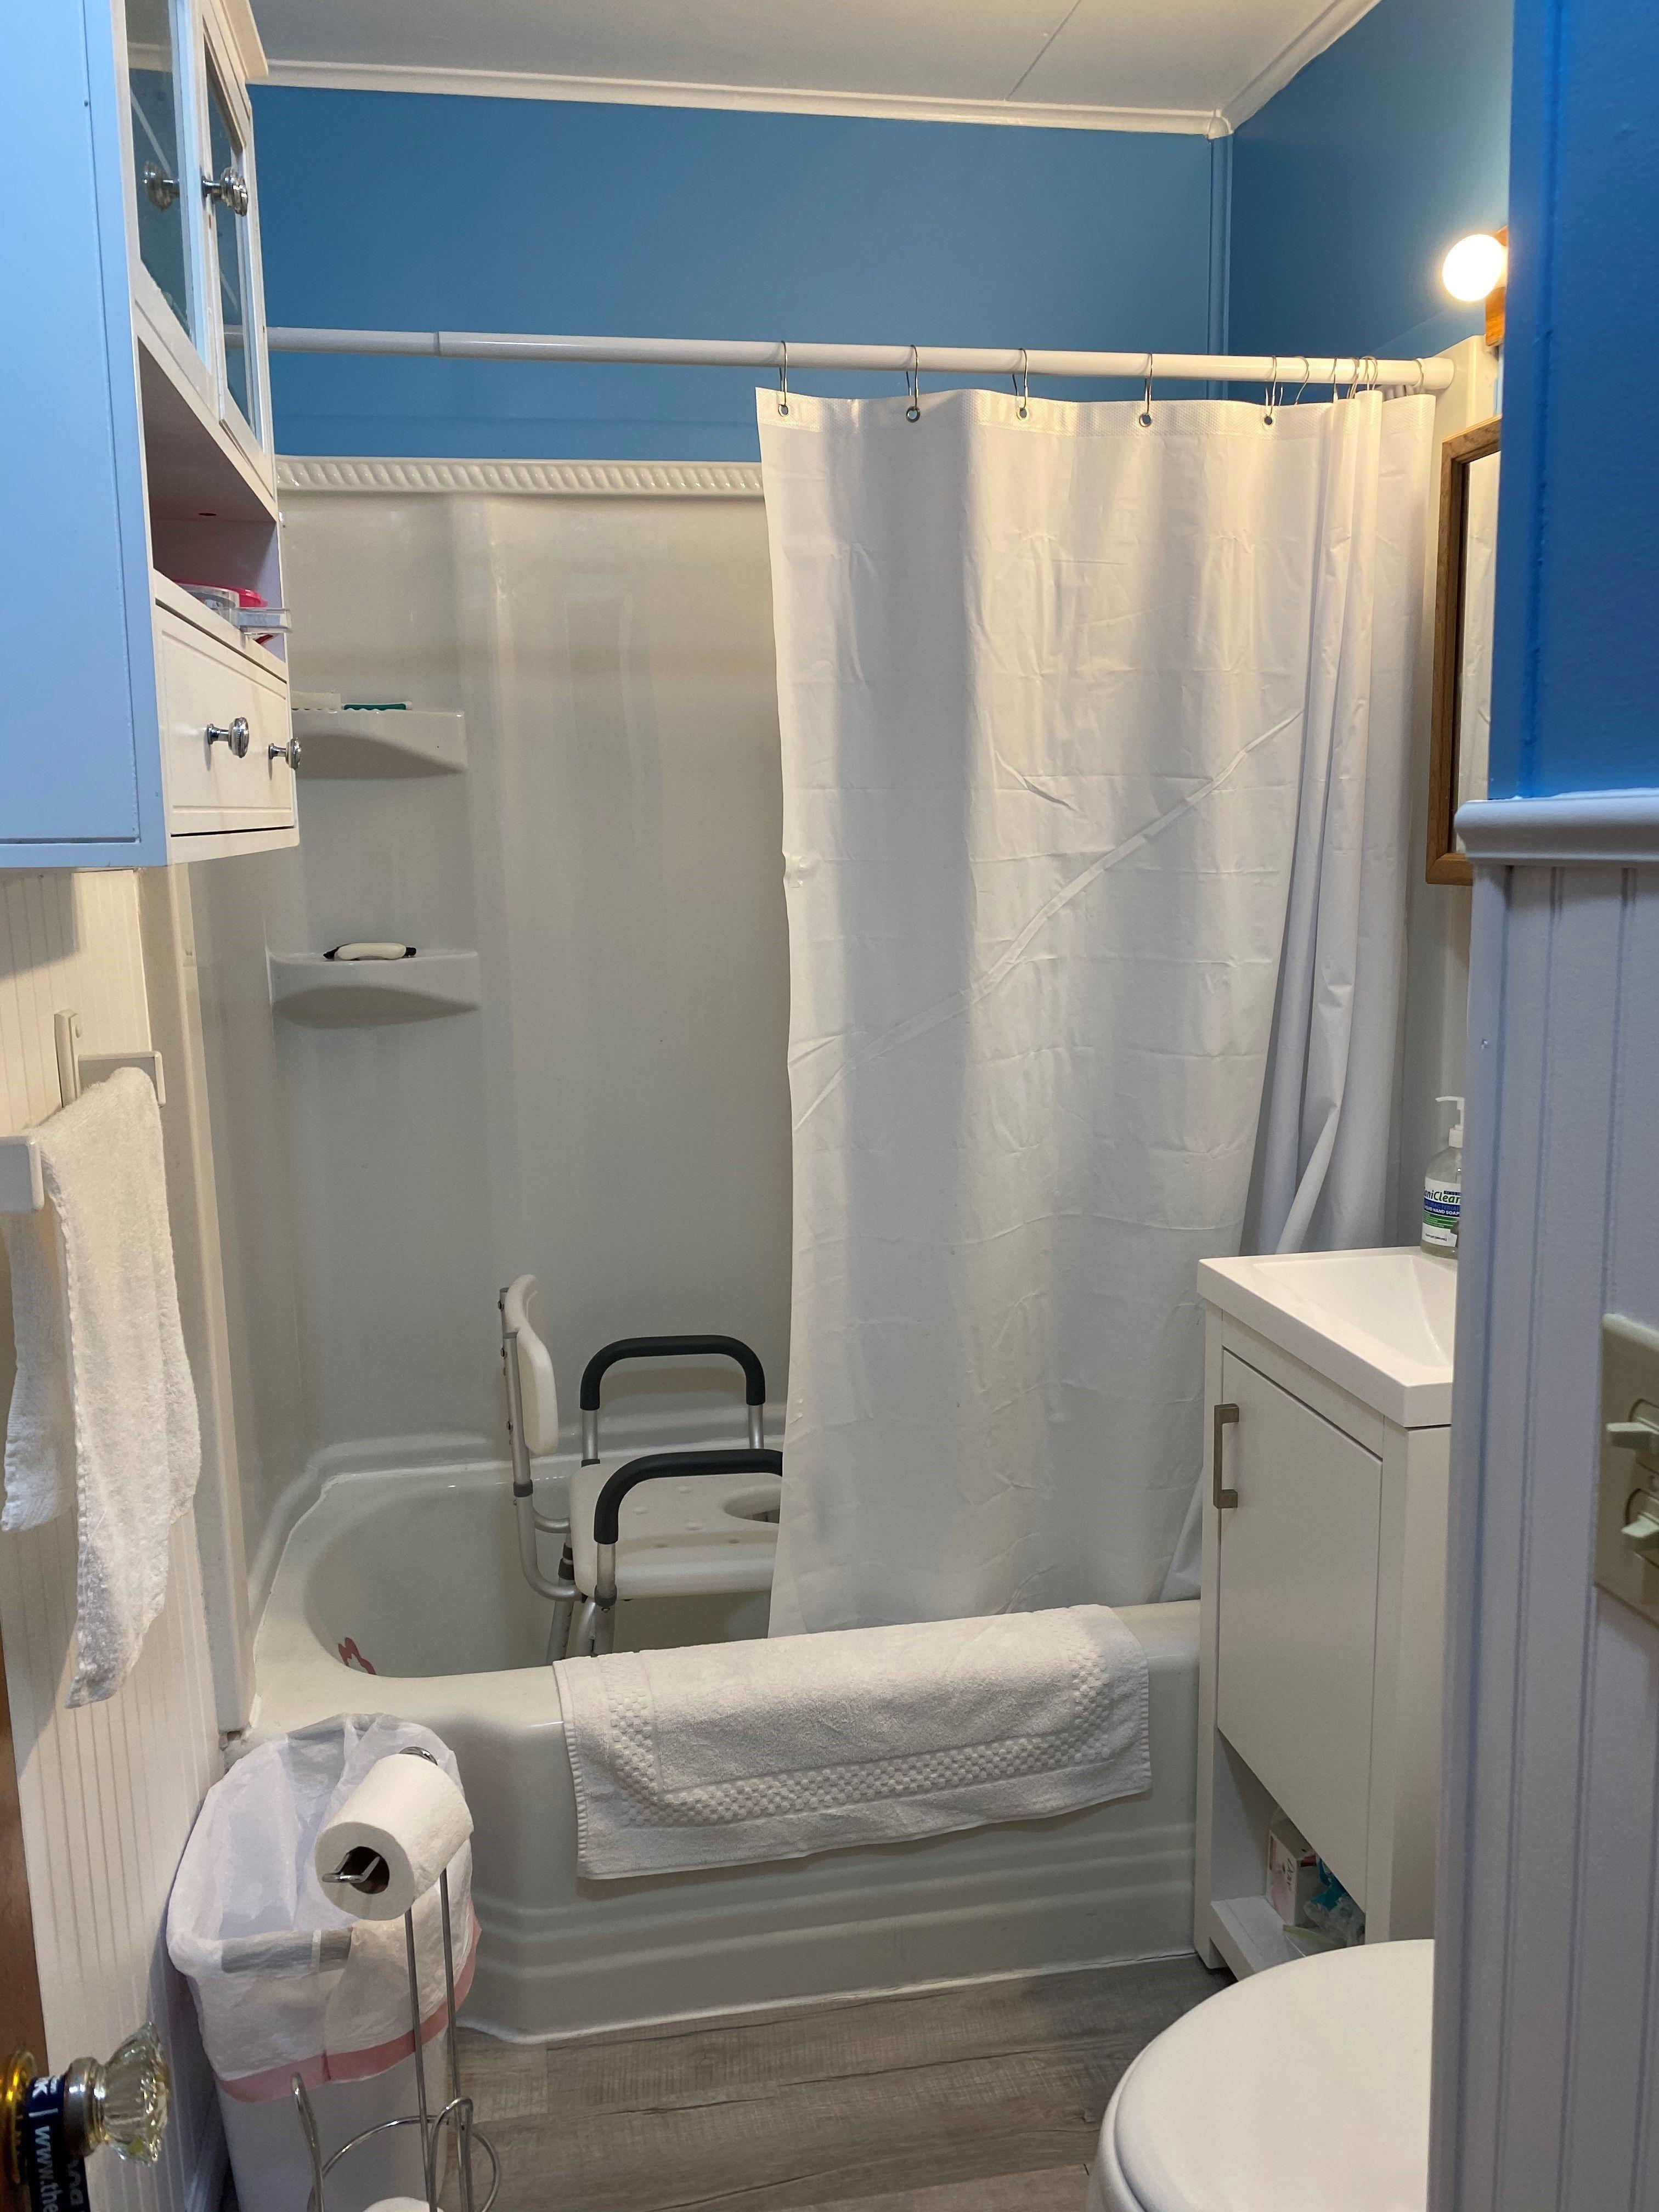 New bathroom a big relief for elderly Springfield homeowner